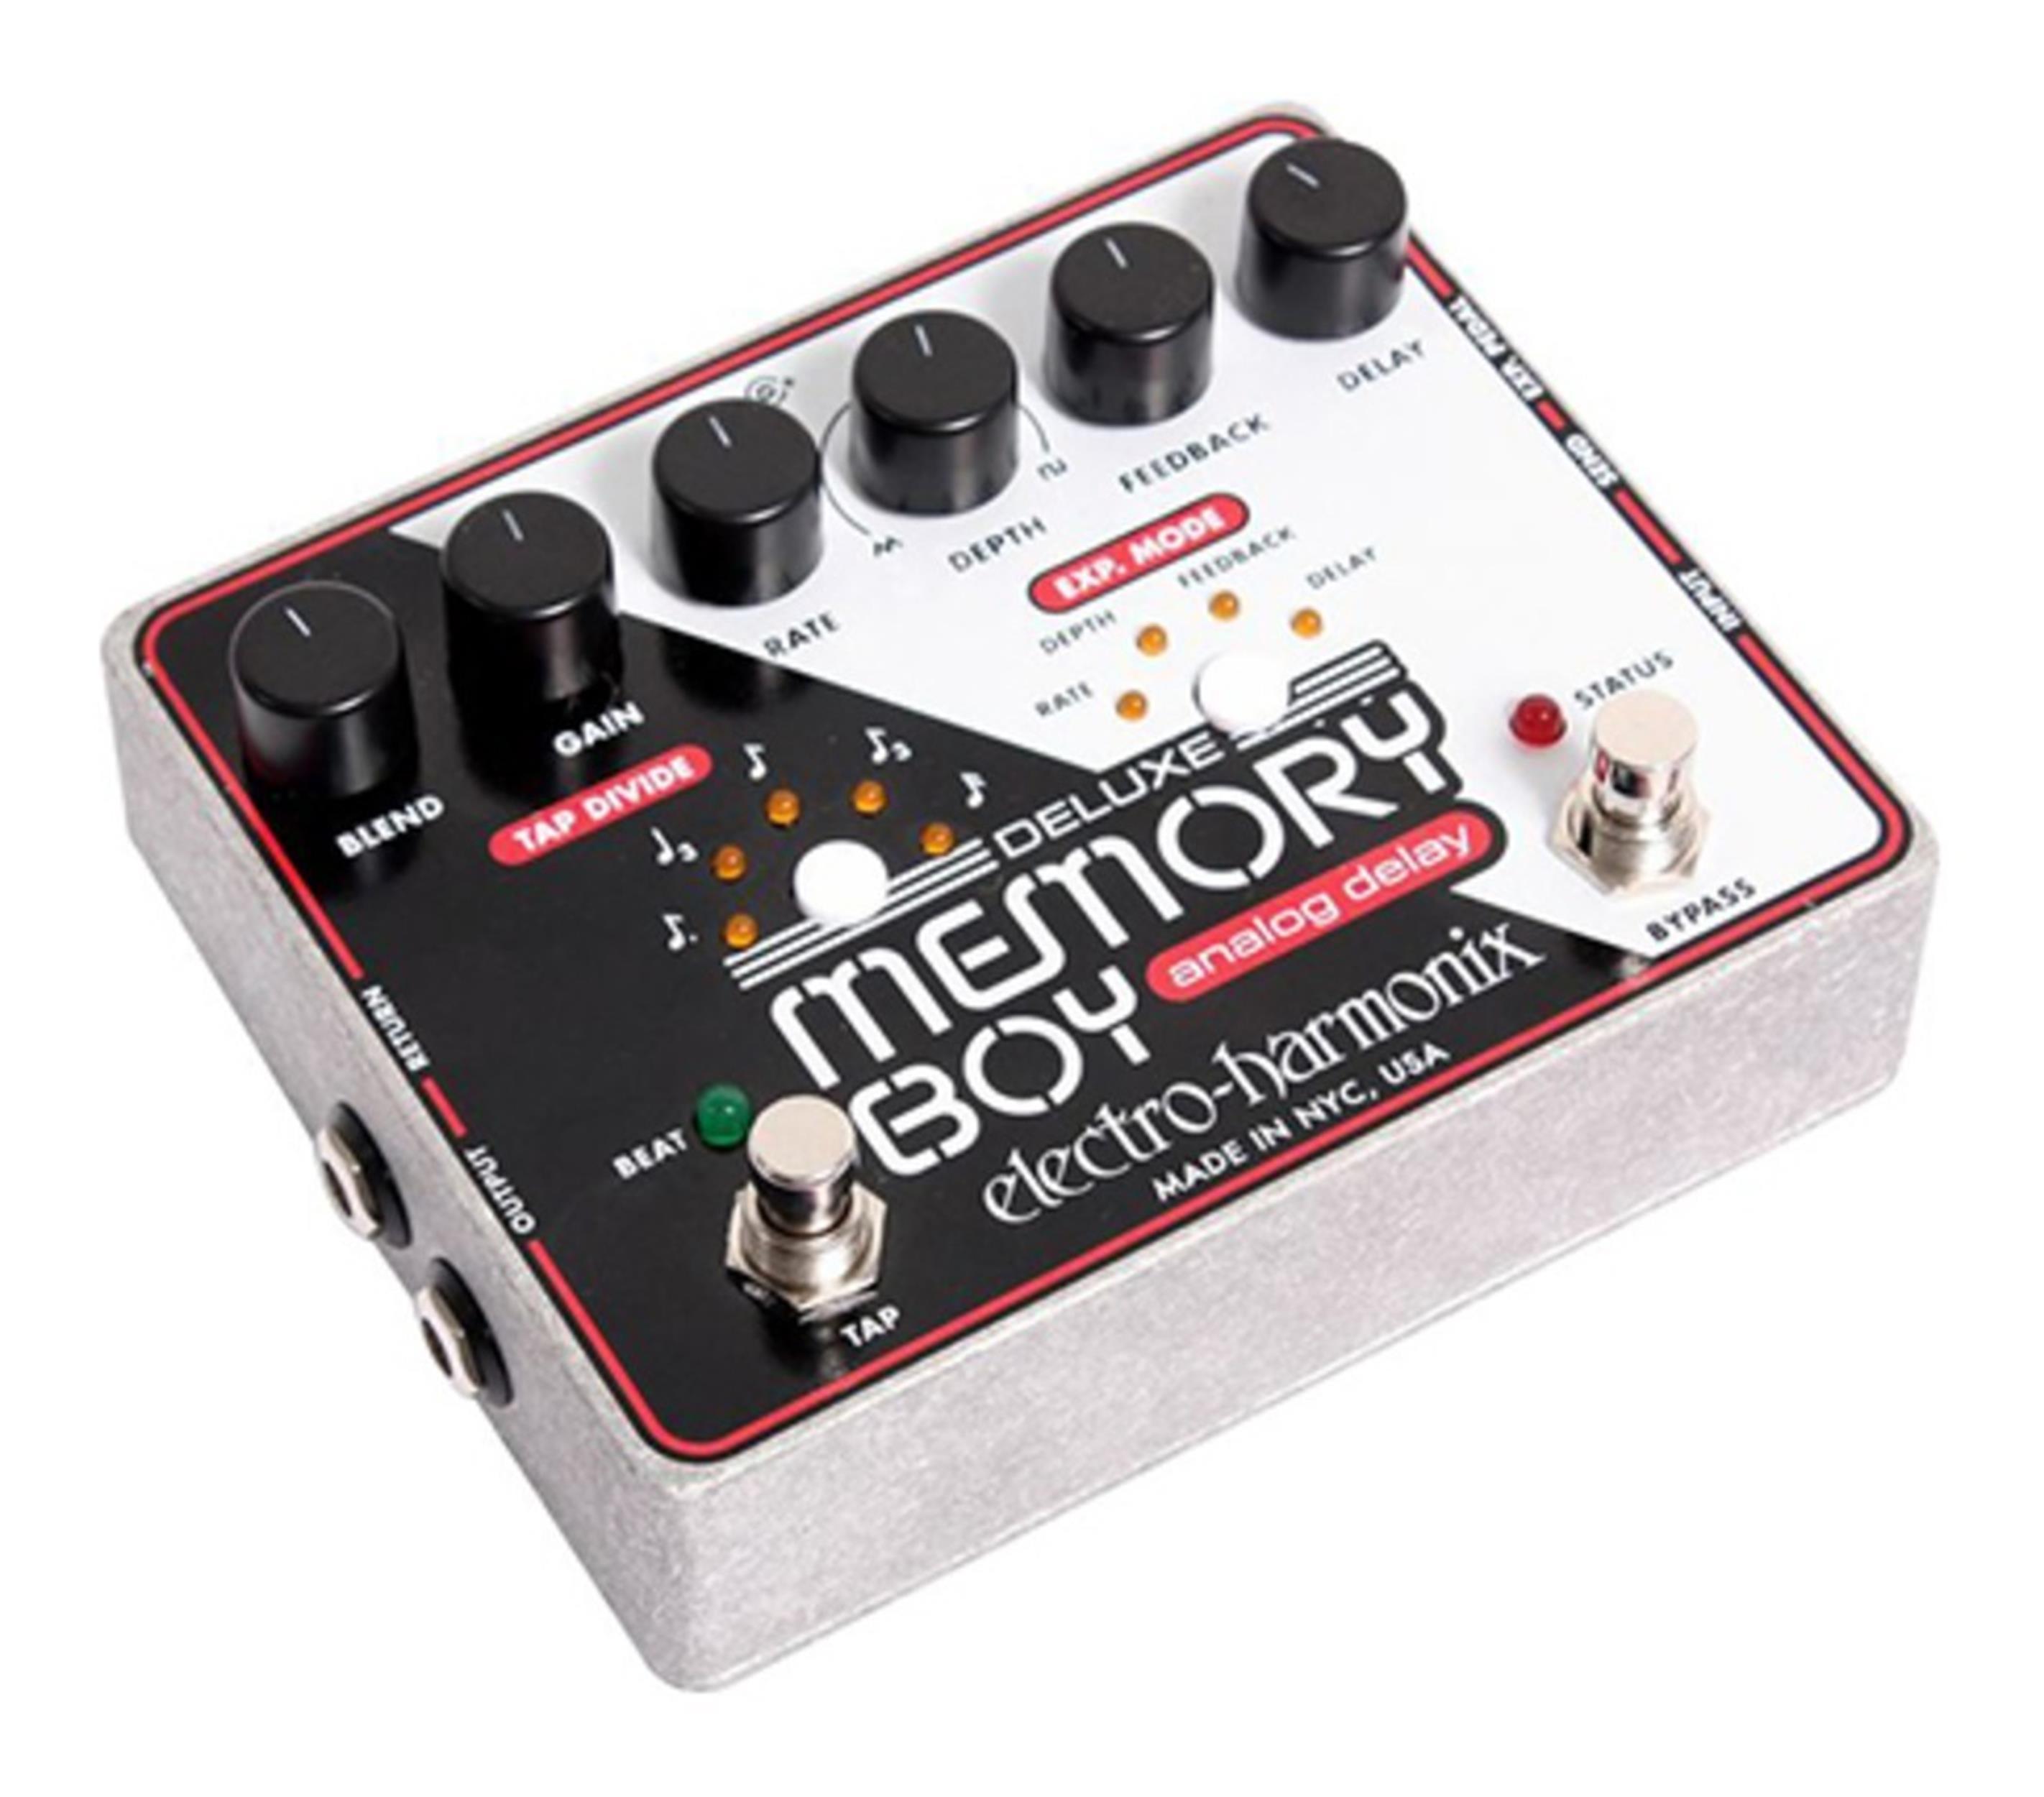 ELECTRO-HARMONIX-MEMORY-BOY-DELUXE-sku-4563